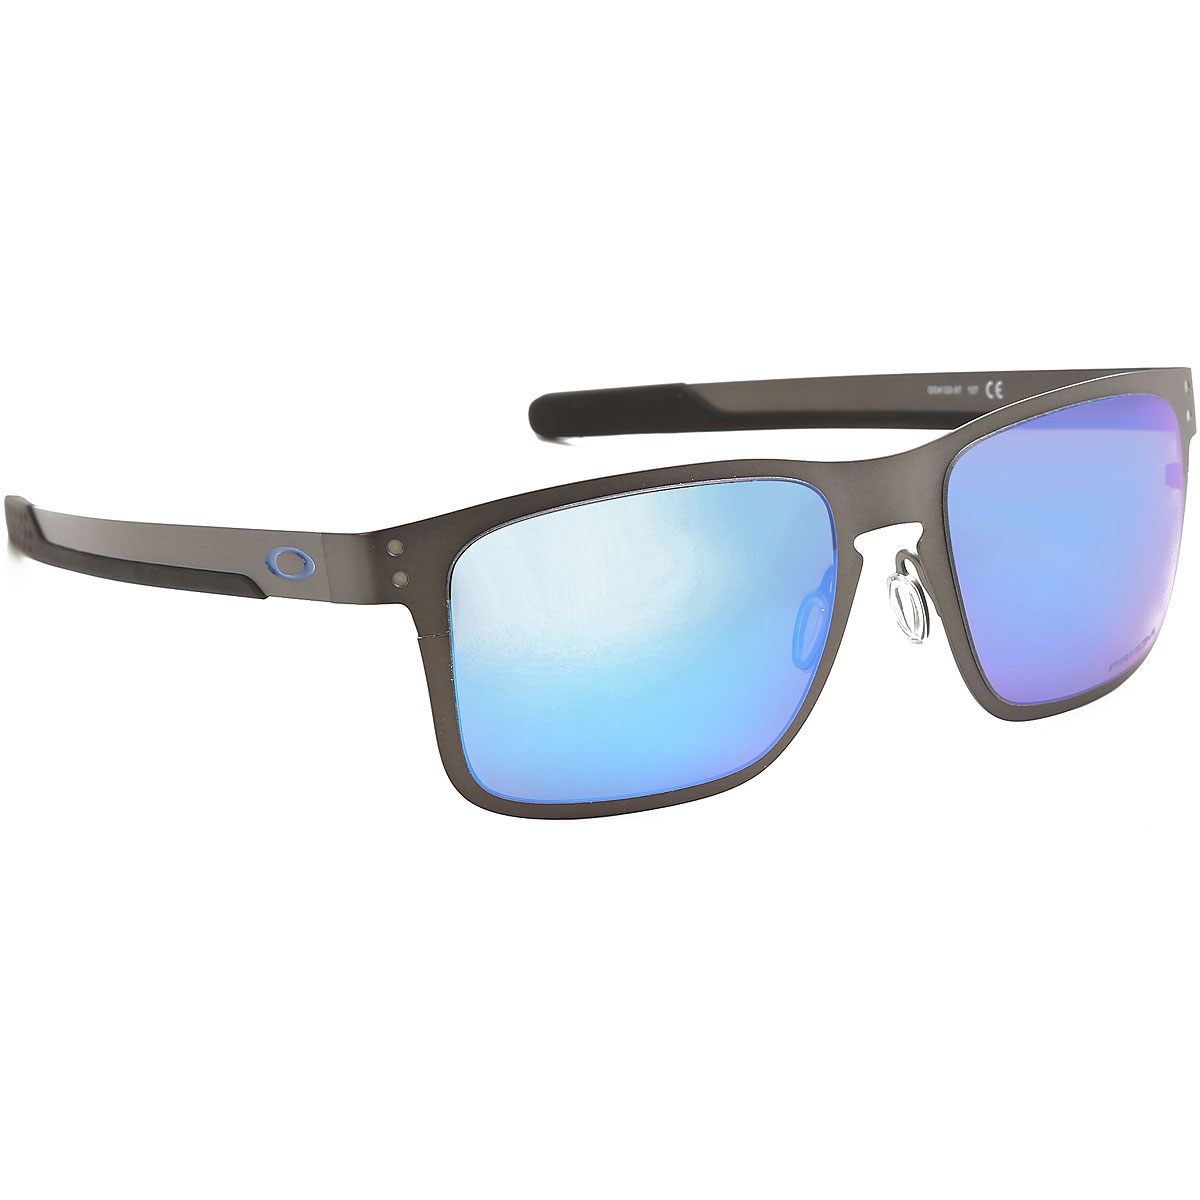 Oakley Sunglasses On Sale, Matt Gunmetal, 2019